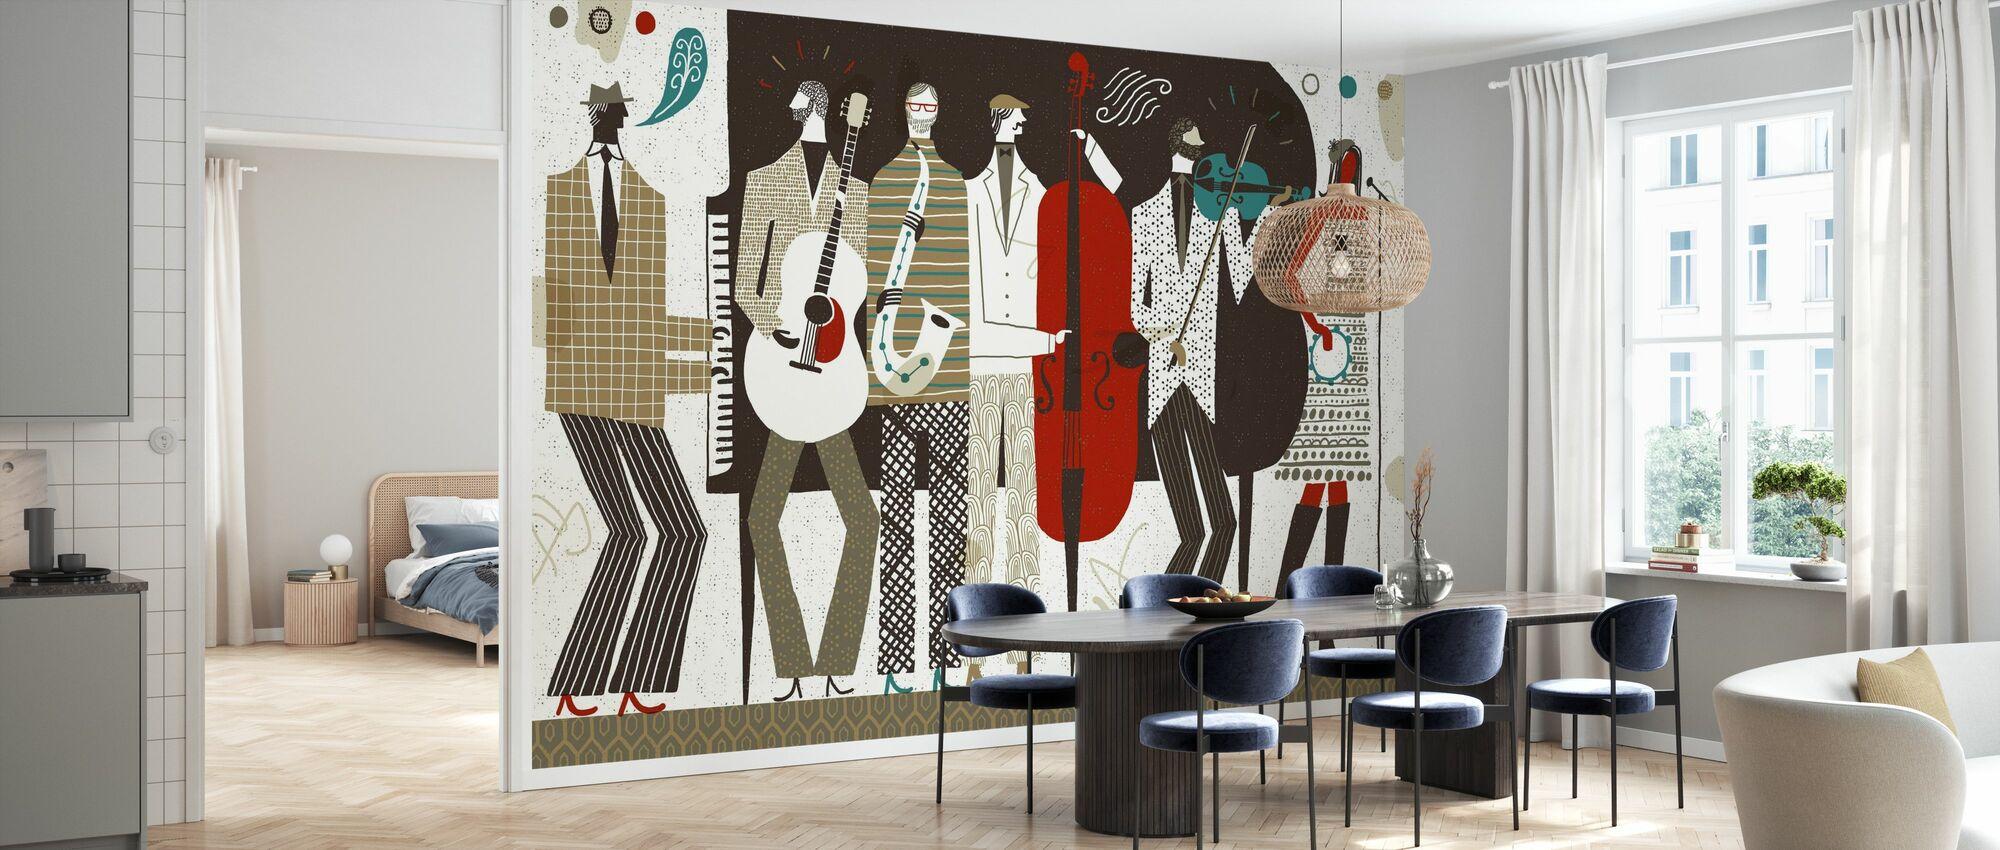 The Band Neutral - Wallpaper - Kitchen